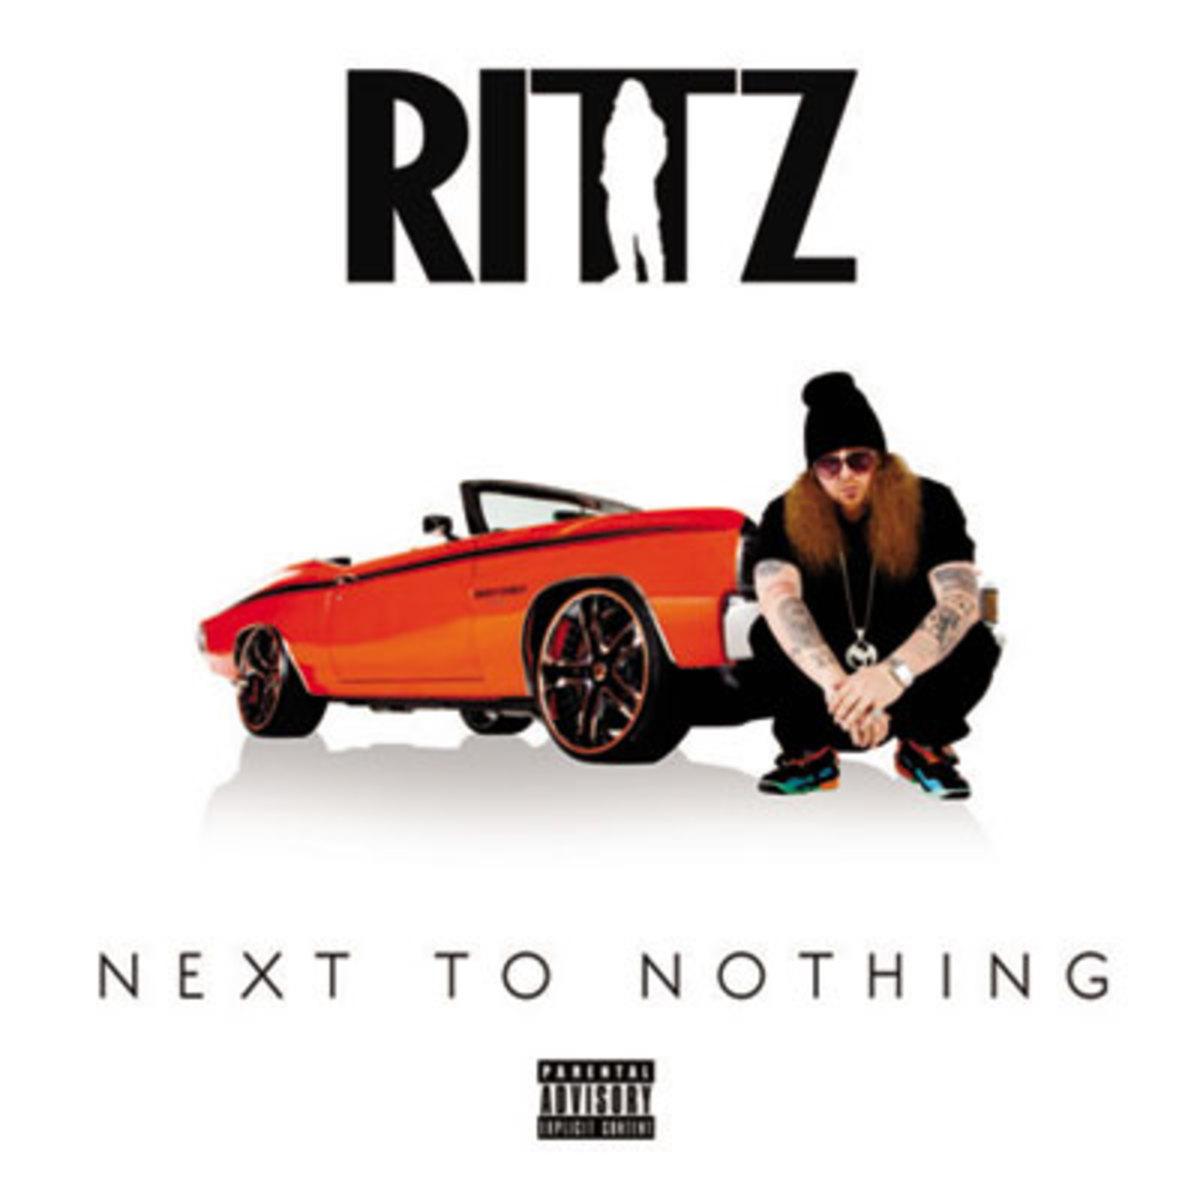 rittz-nexttonothing.jpg